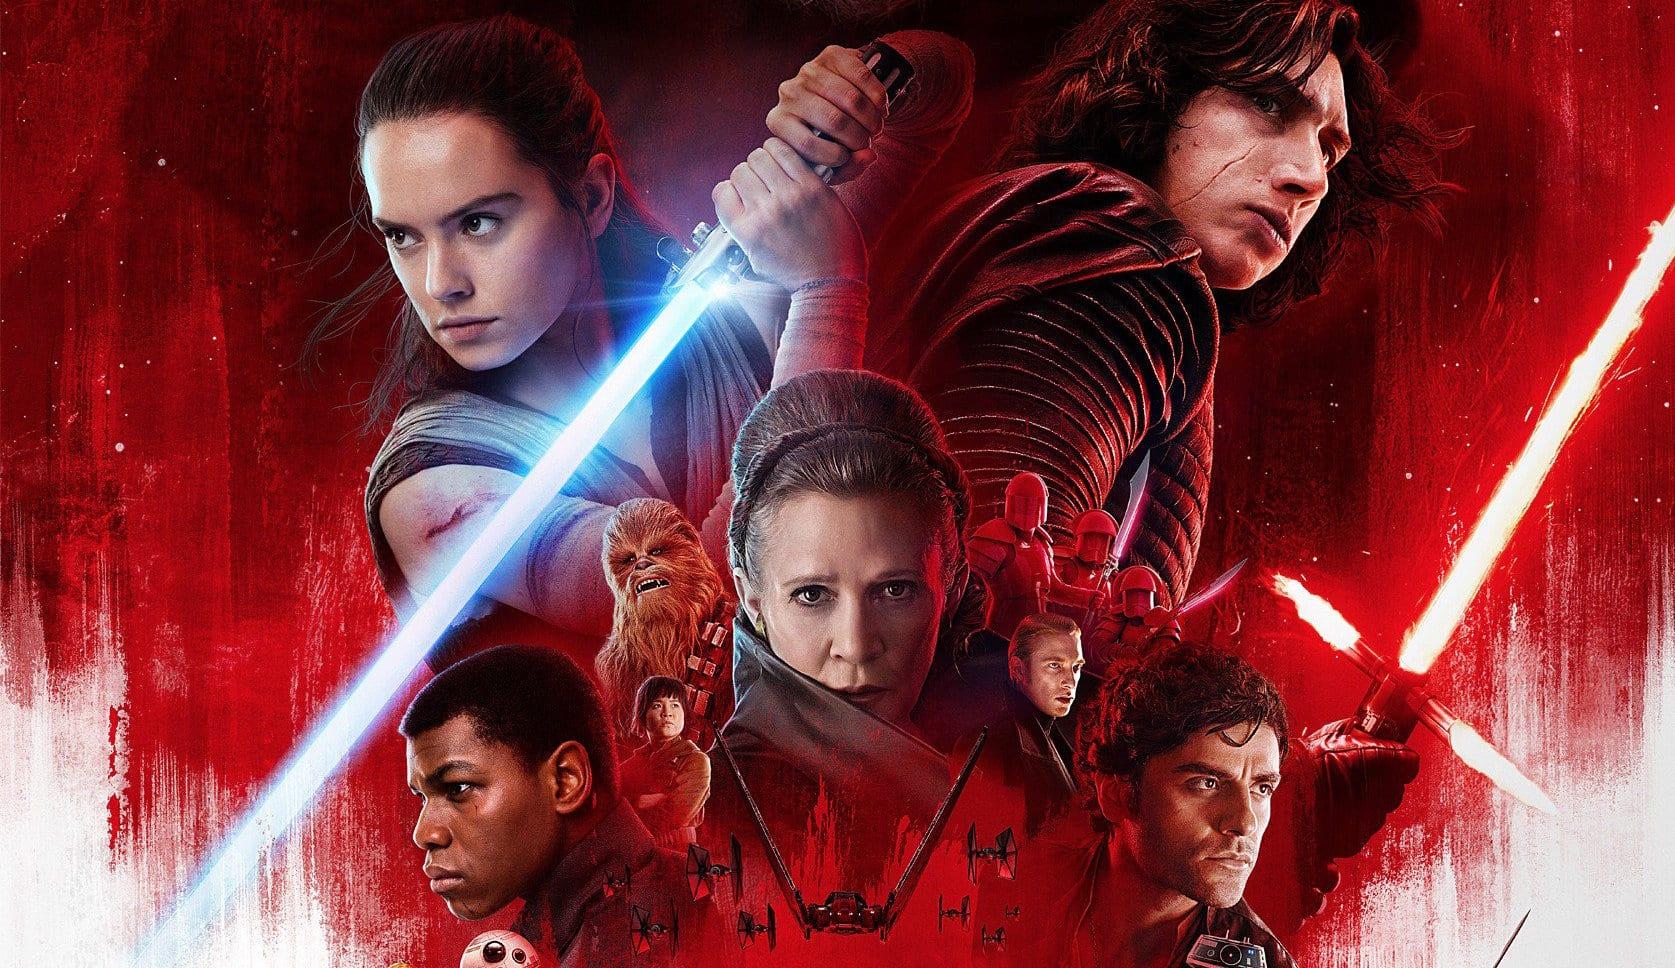 REVIEW – Star Wars VIII : Les Derniers Jedi